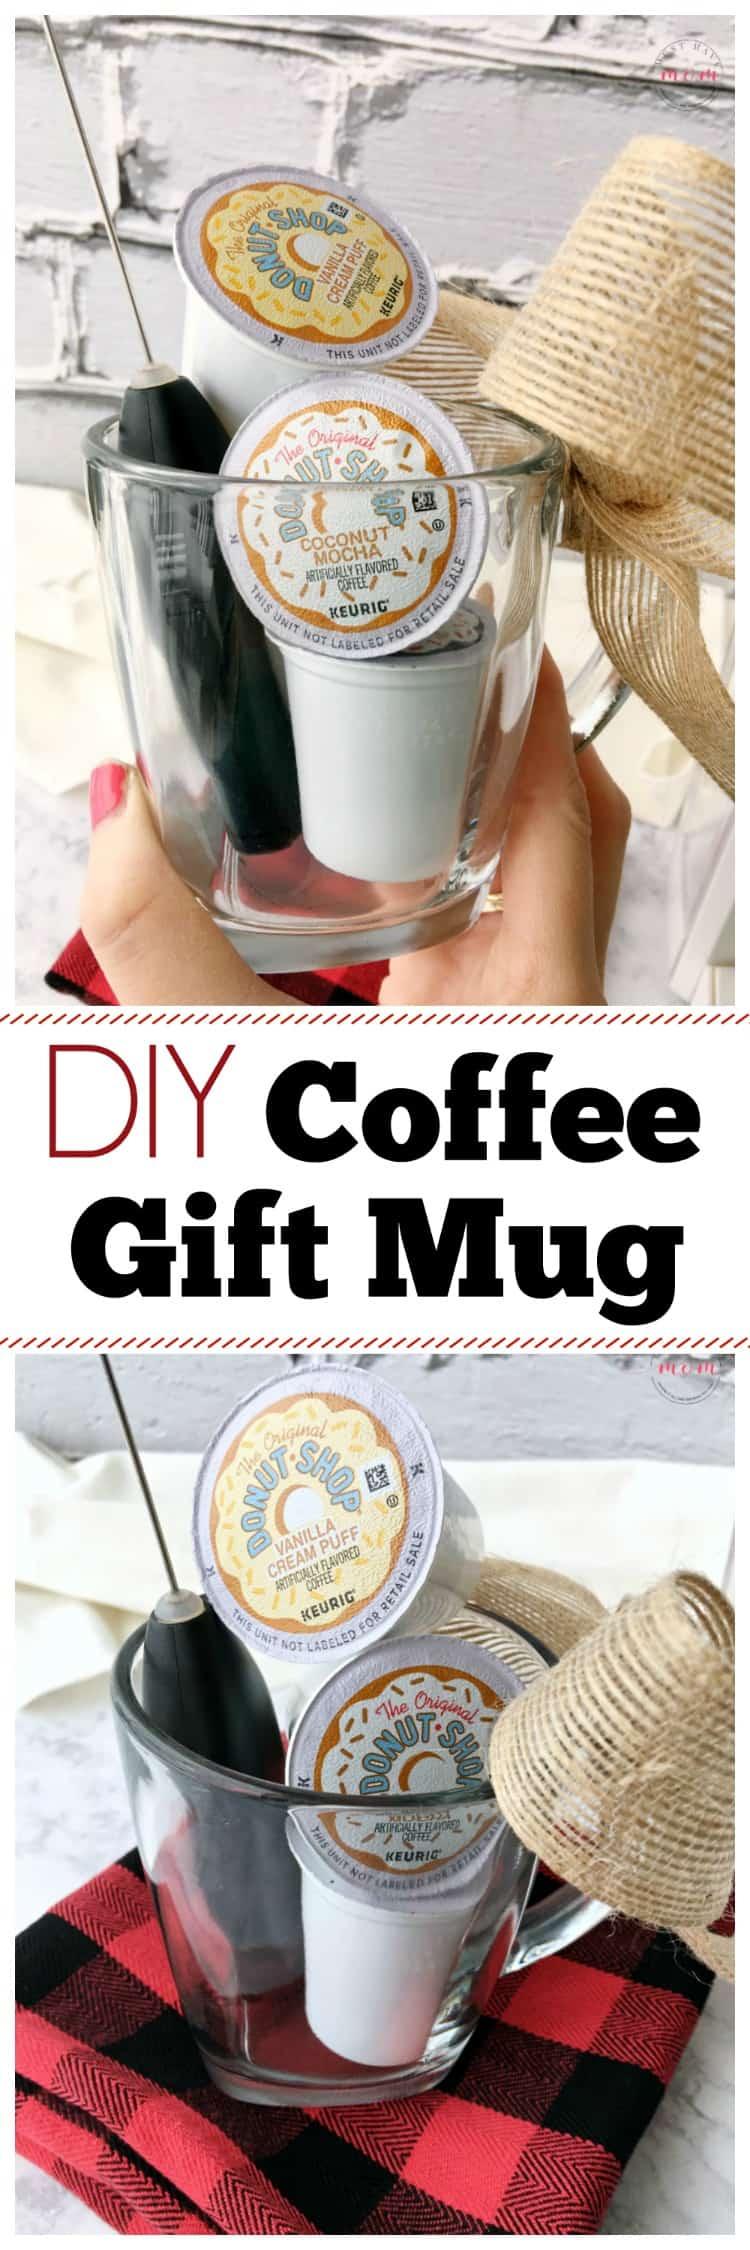 DIY Coffee Gifts! Fun coffee mug gift ideas and coffee gifts!